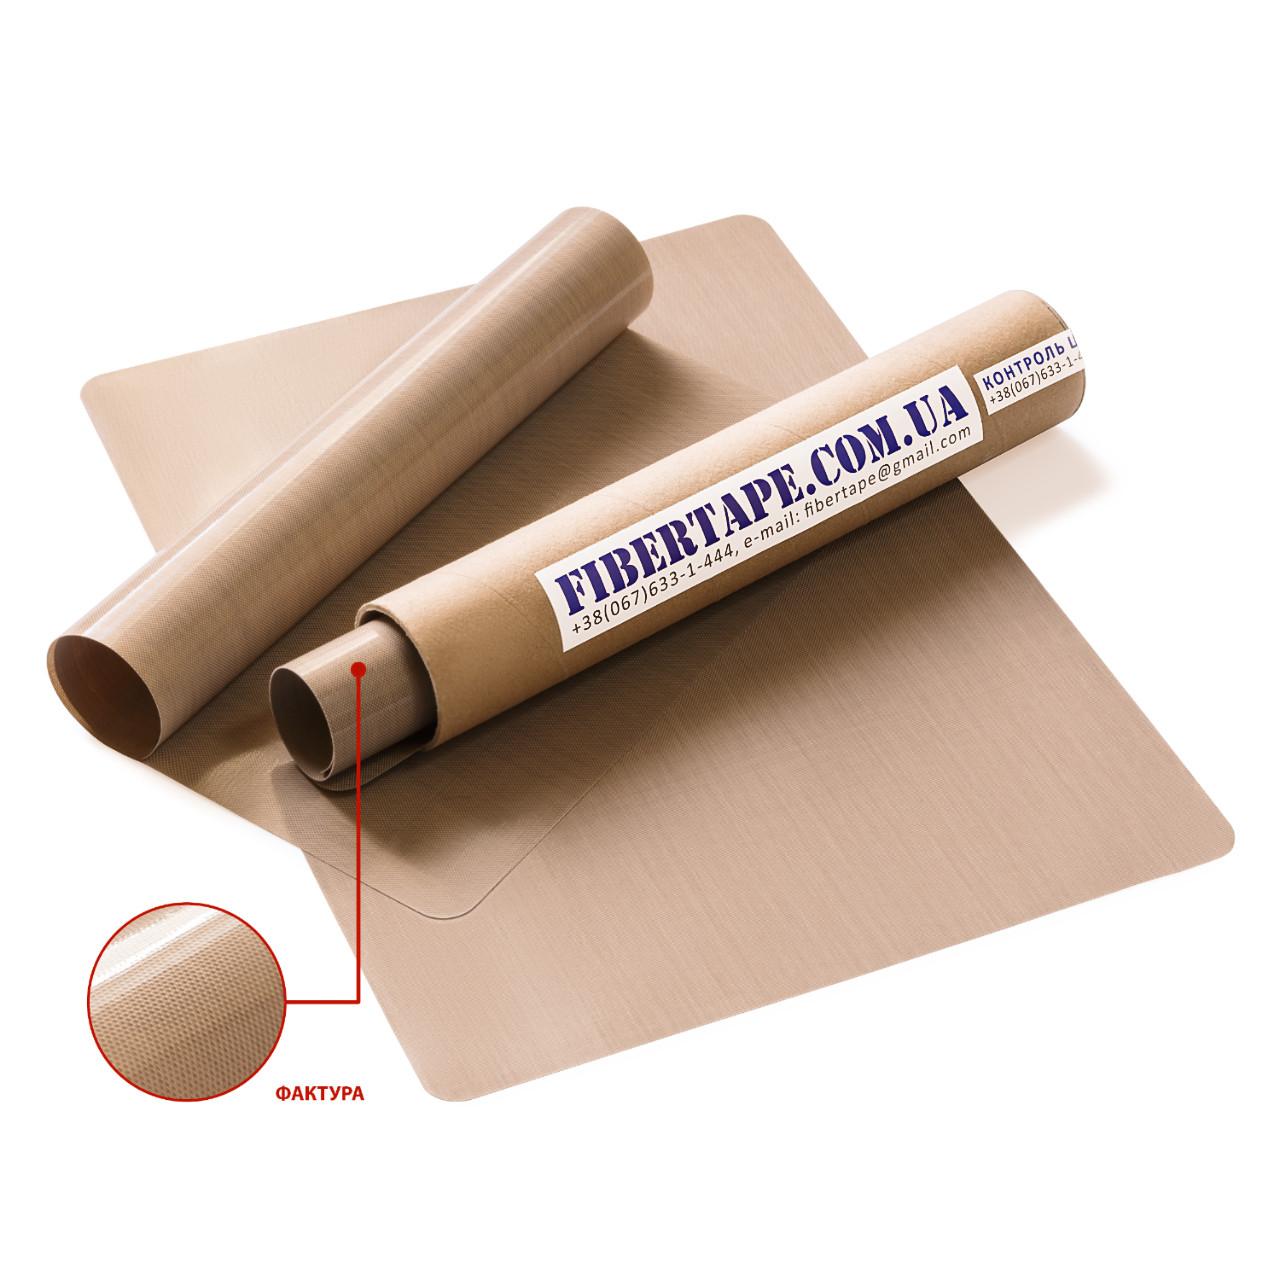 Тефлоновый коврик 30х40 см 0,13 мм для выпечки